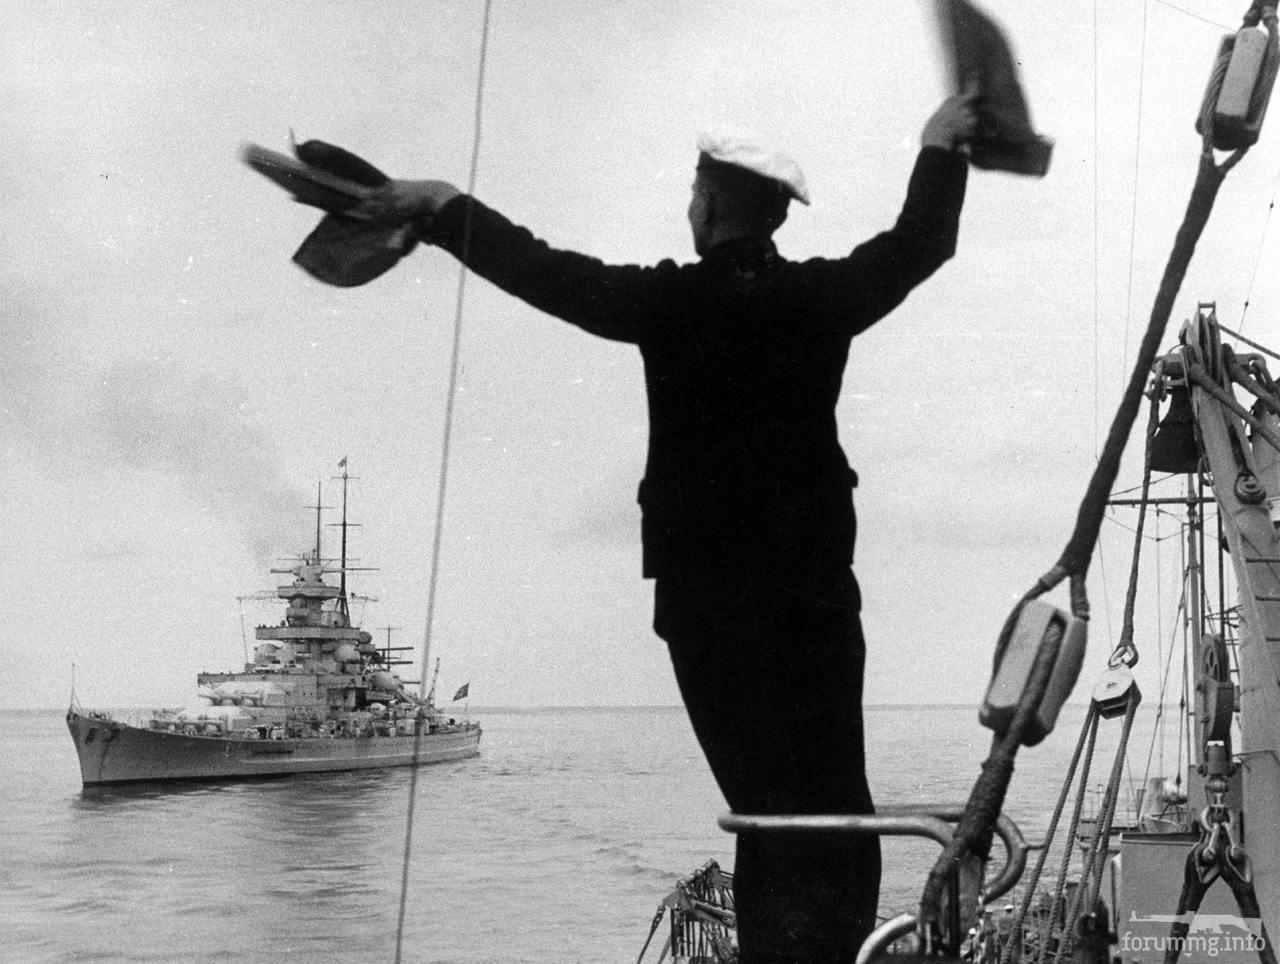 125859 - Линкор Gneisenau, Киль, июнь 1939 г.